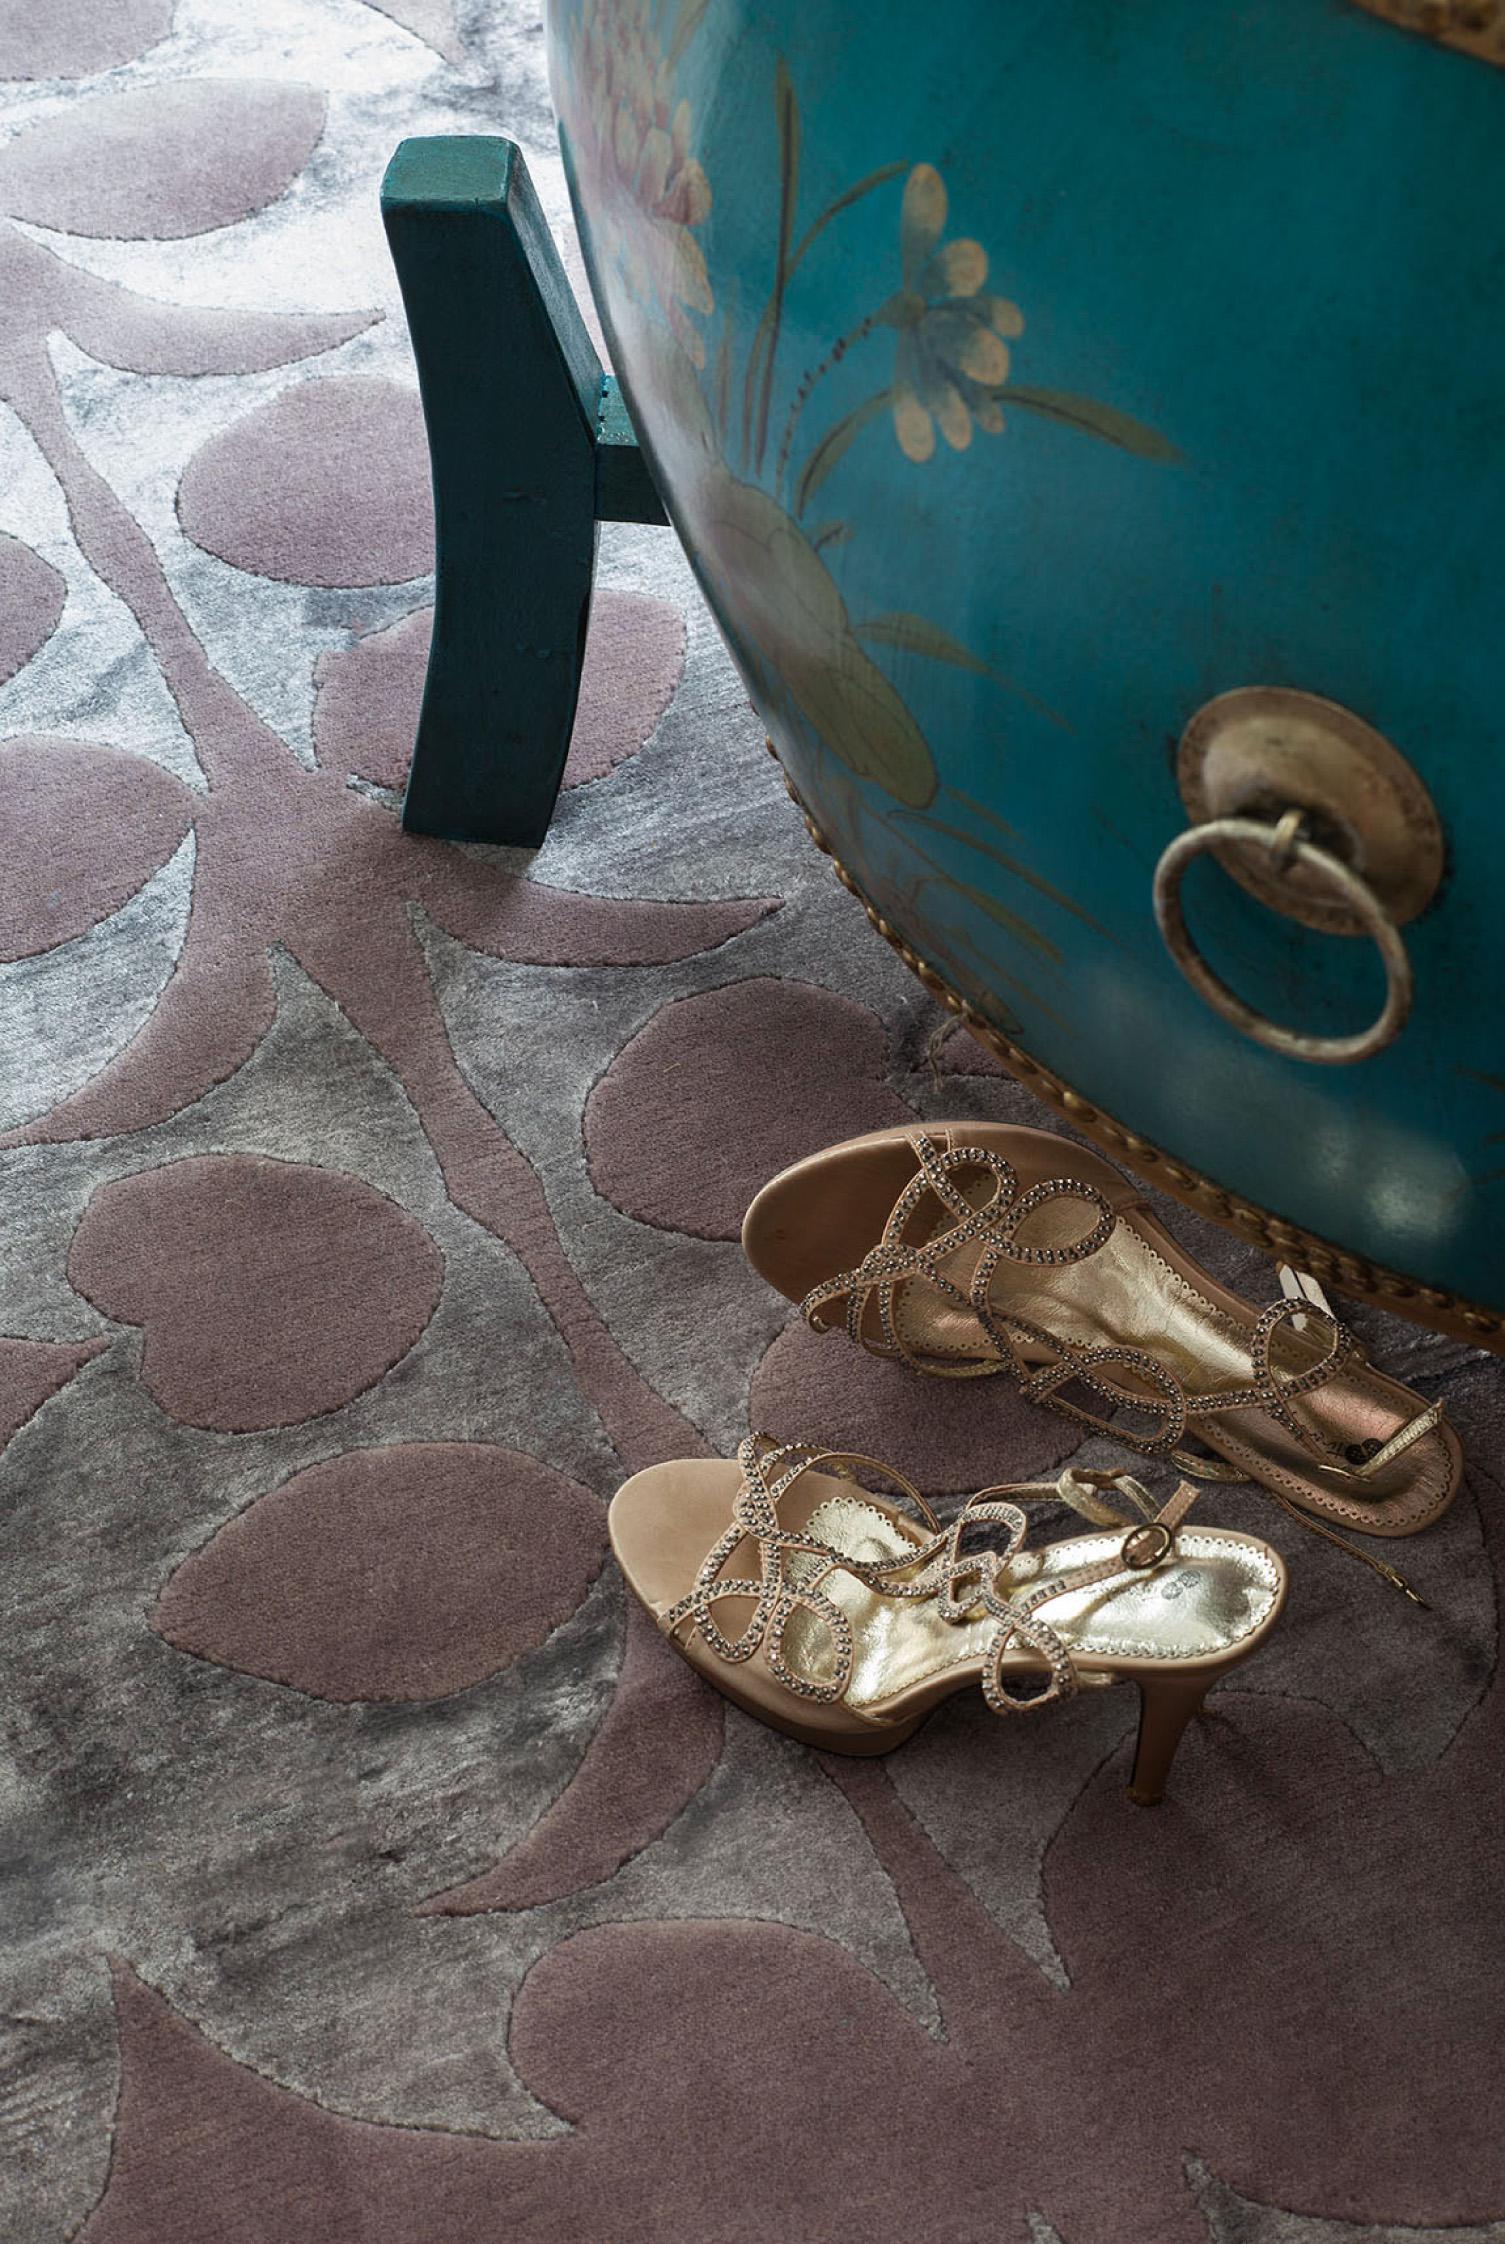 Red Carpet purple heart detail